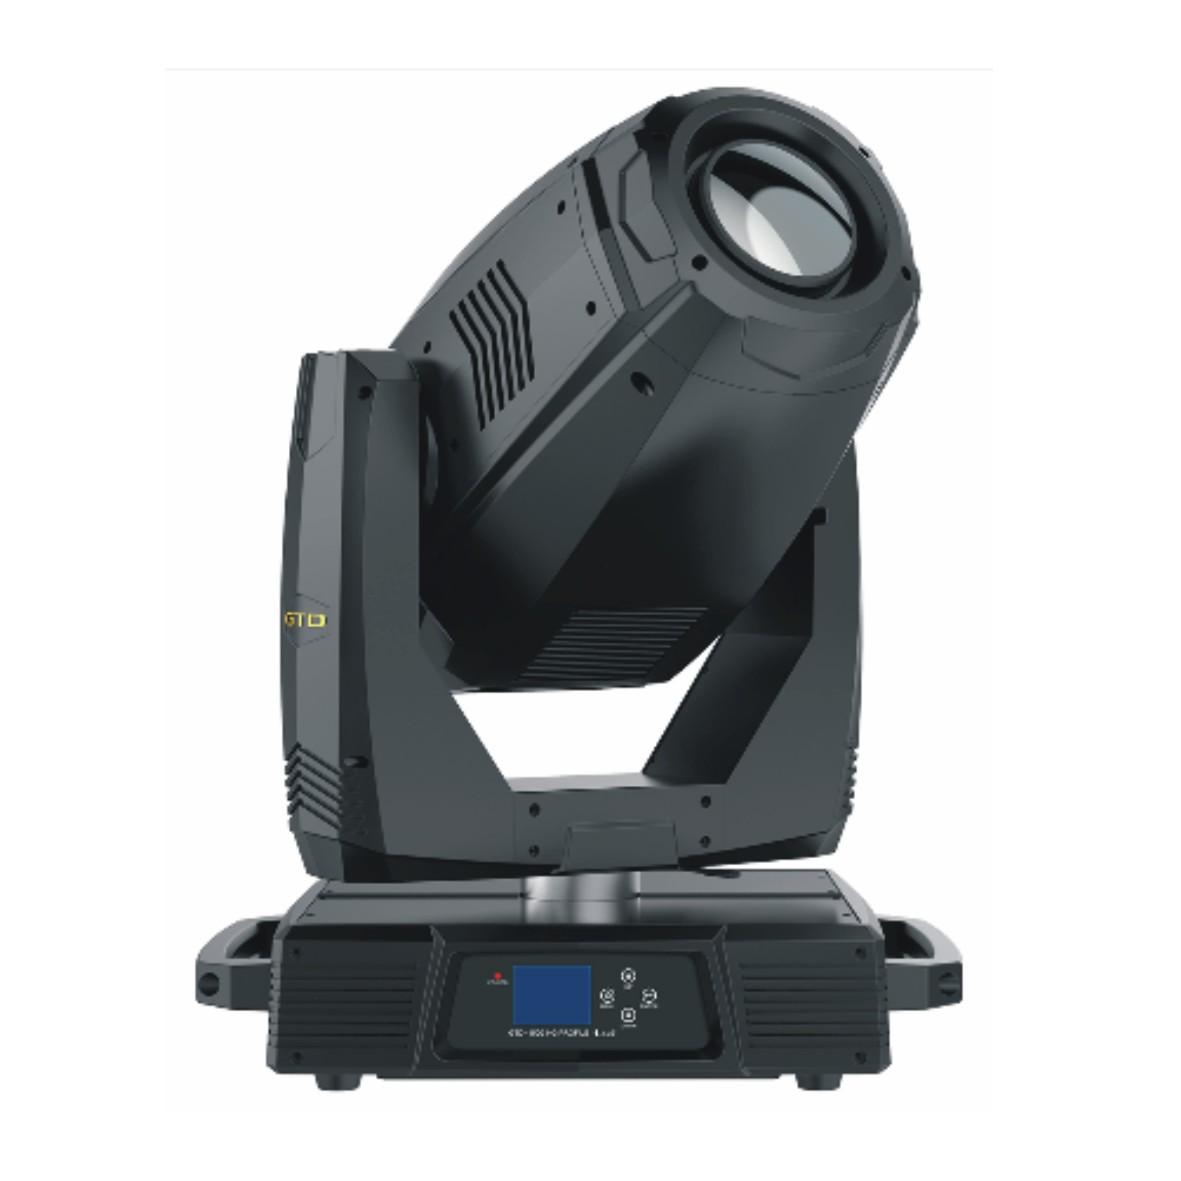 GTD-1500 I-G PROFILE 电脑摇头切割灯